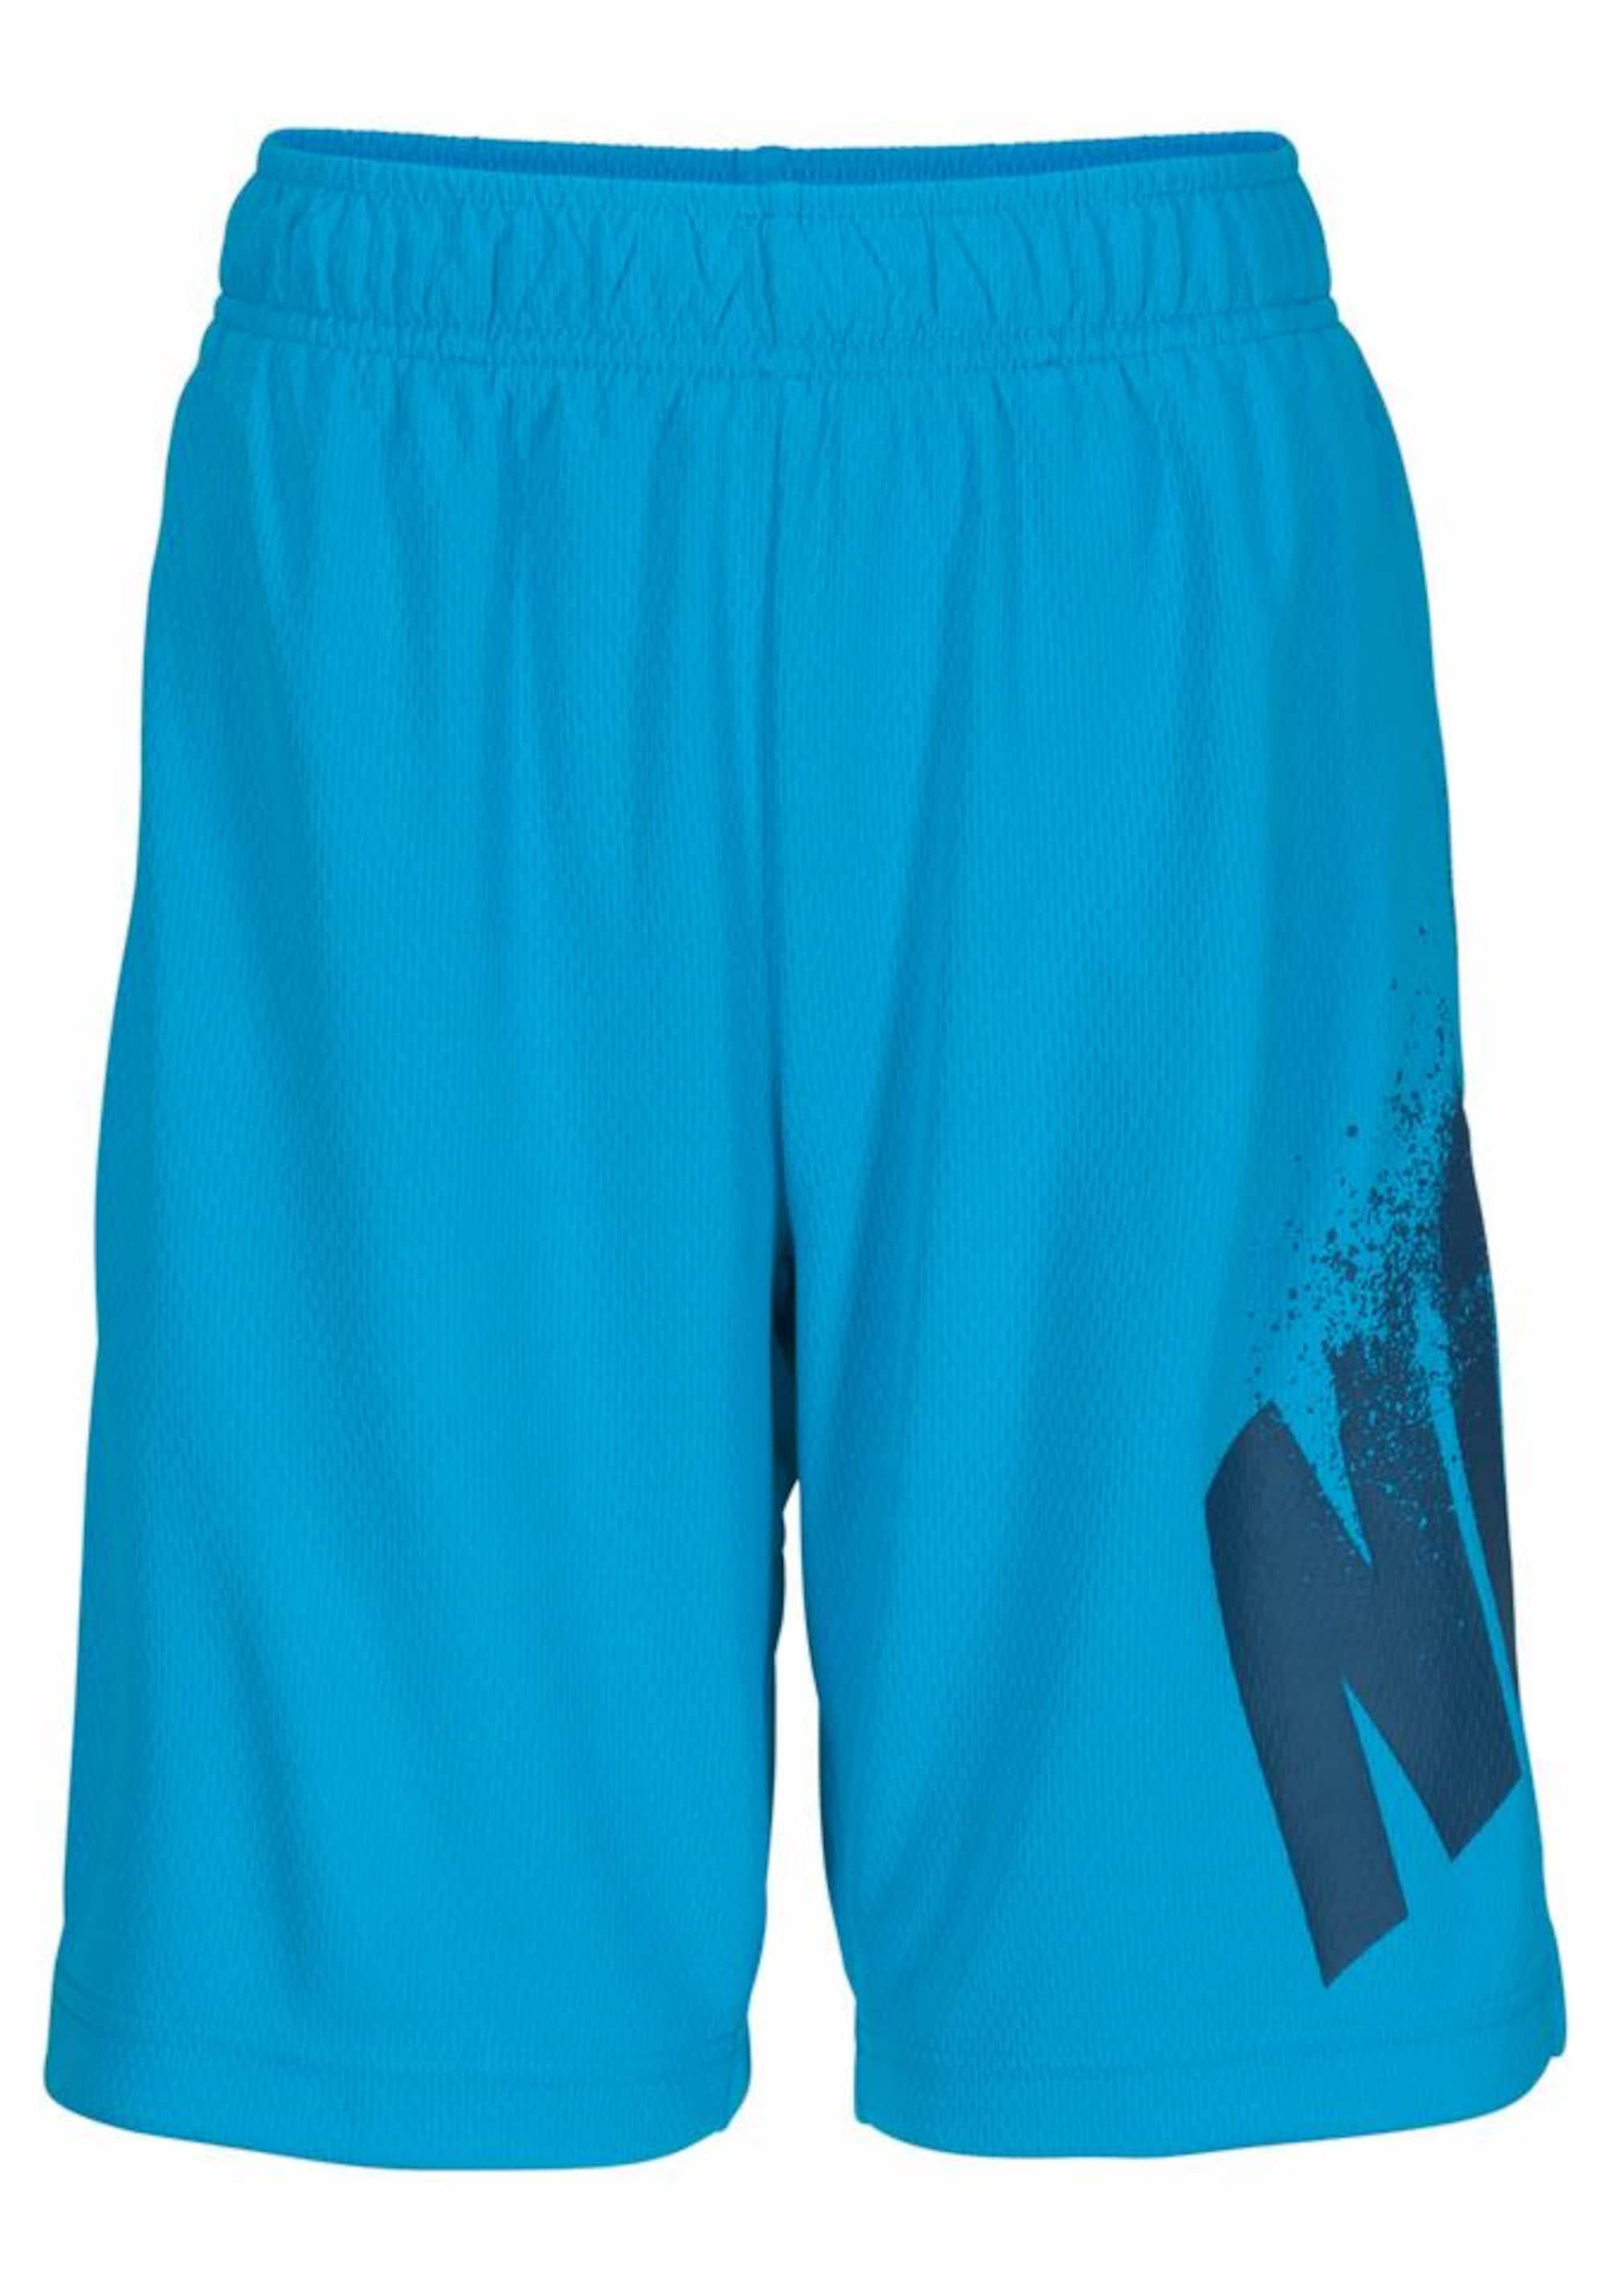 Shorts ´DRY SHORT GFX´